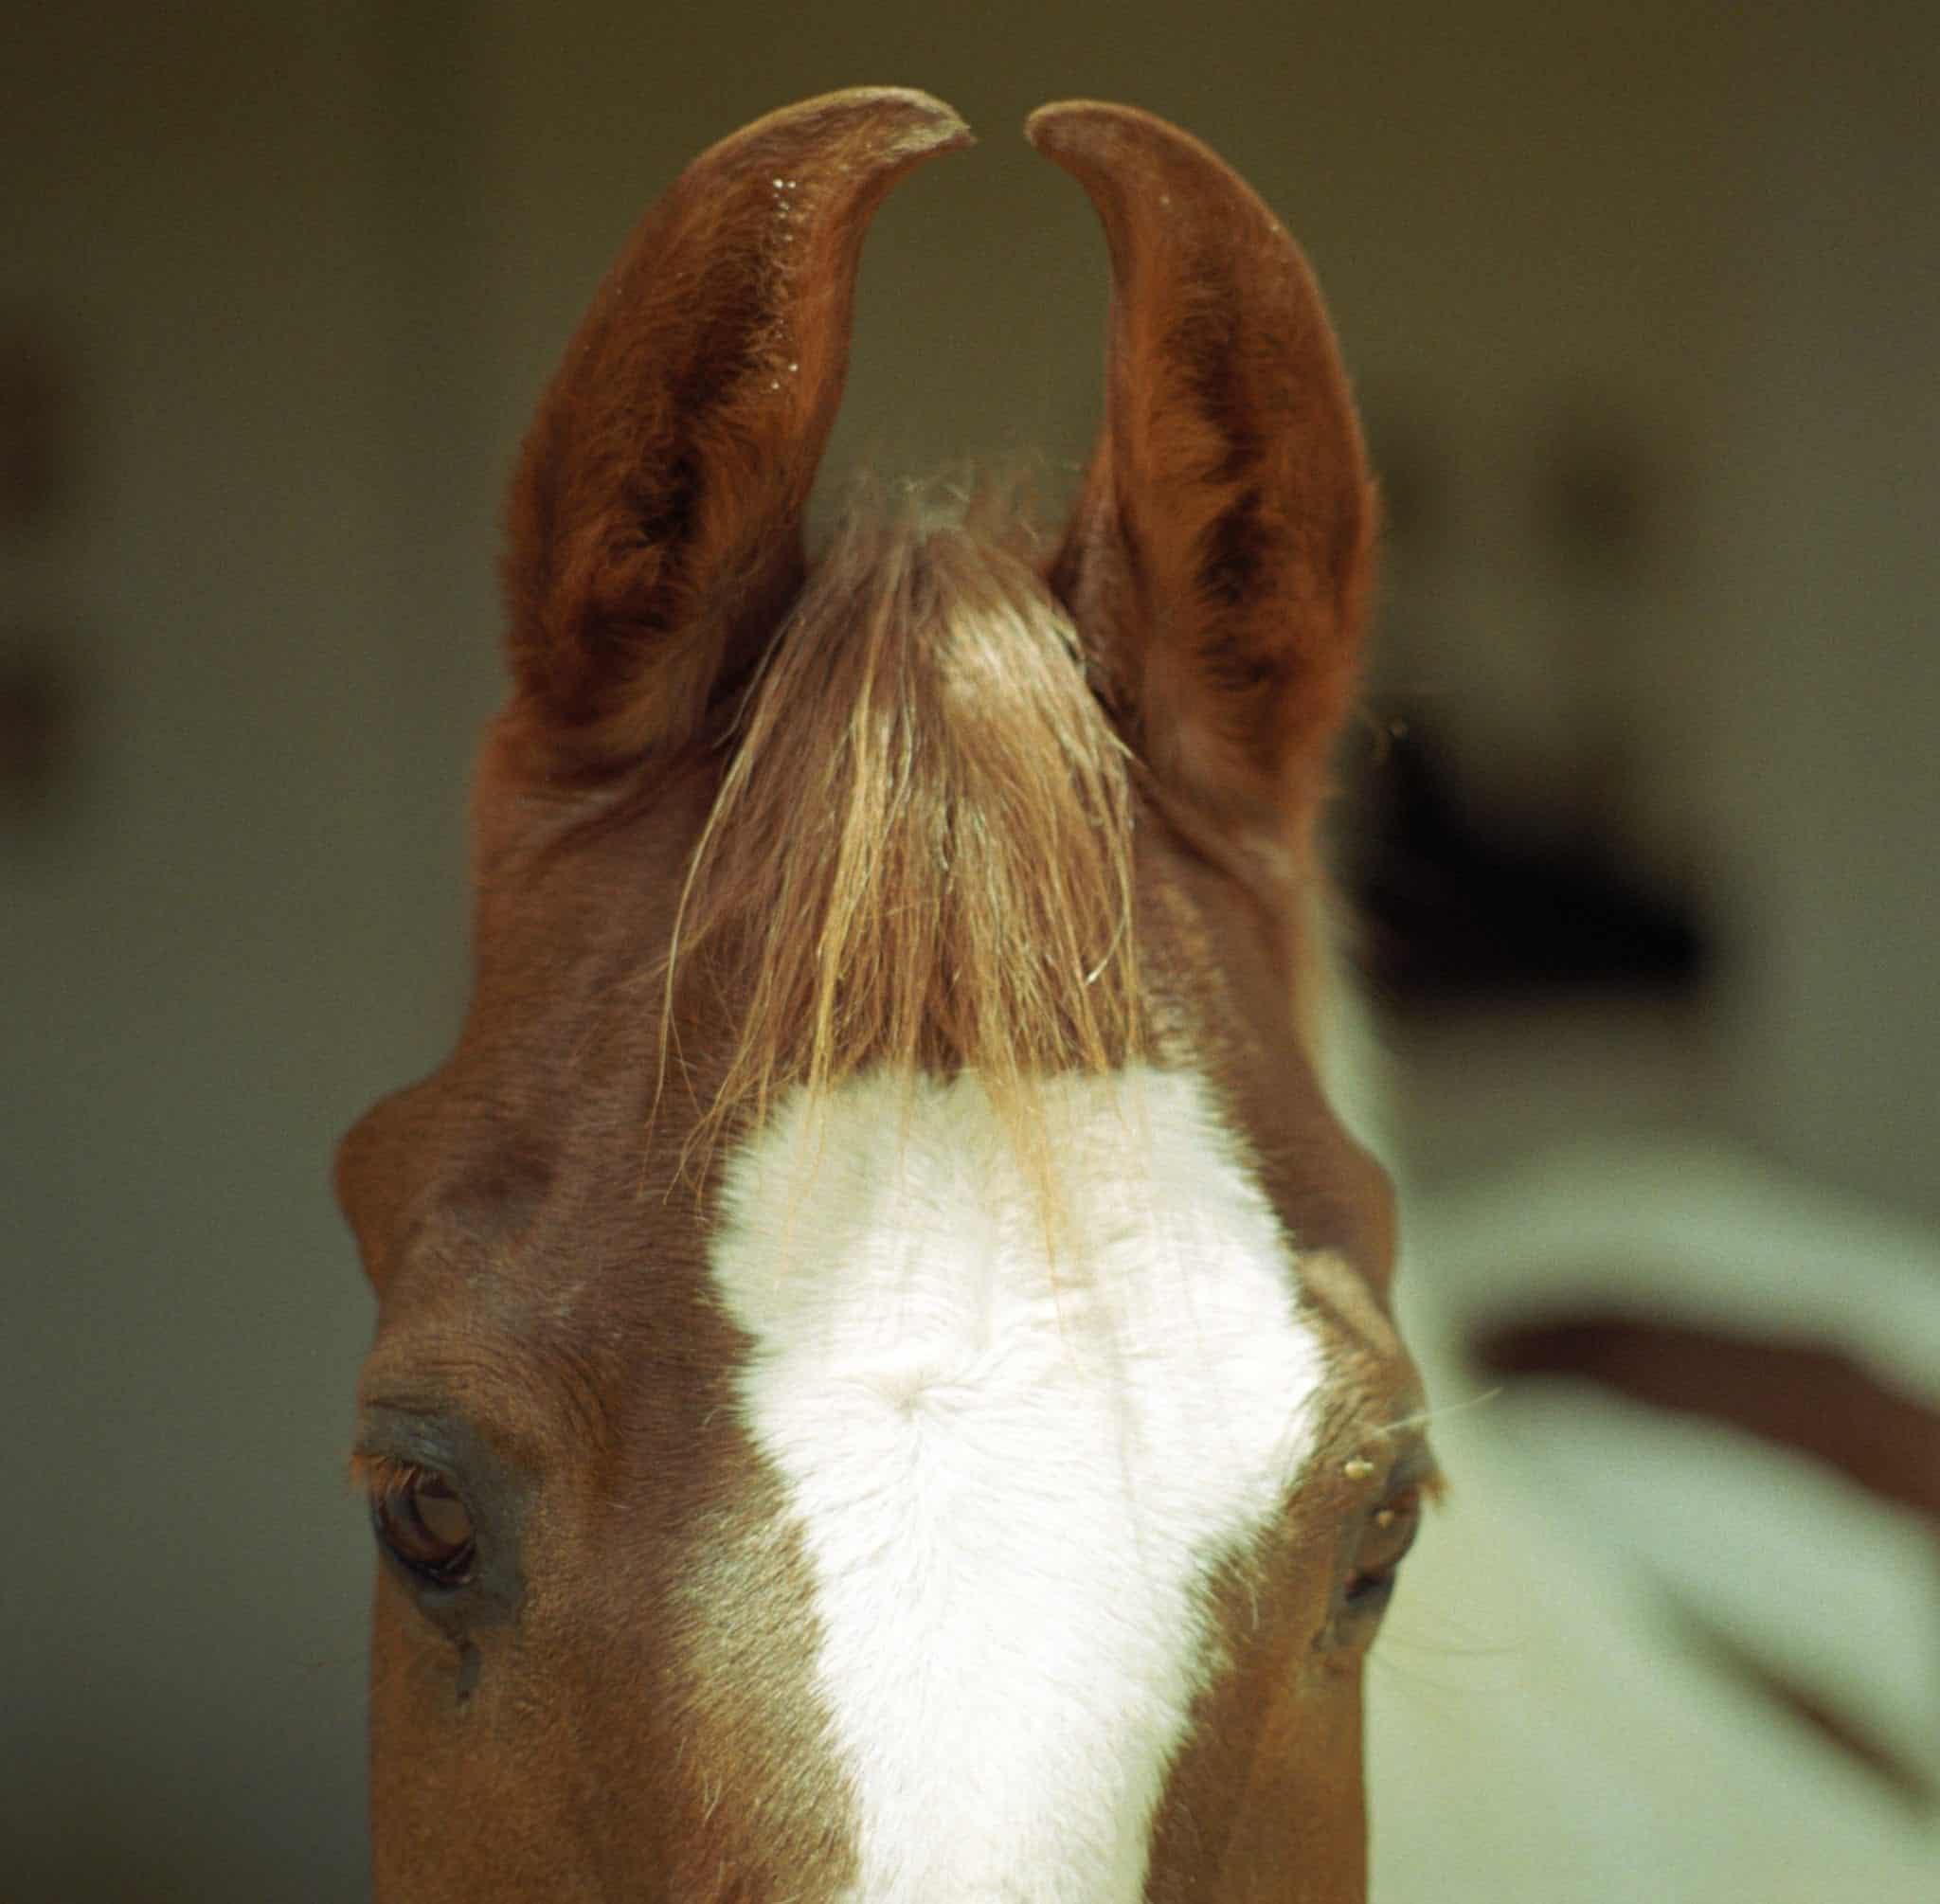 Head shot of Marwari horse with characteristic curved ears.